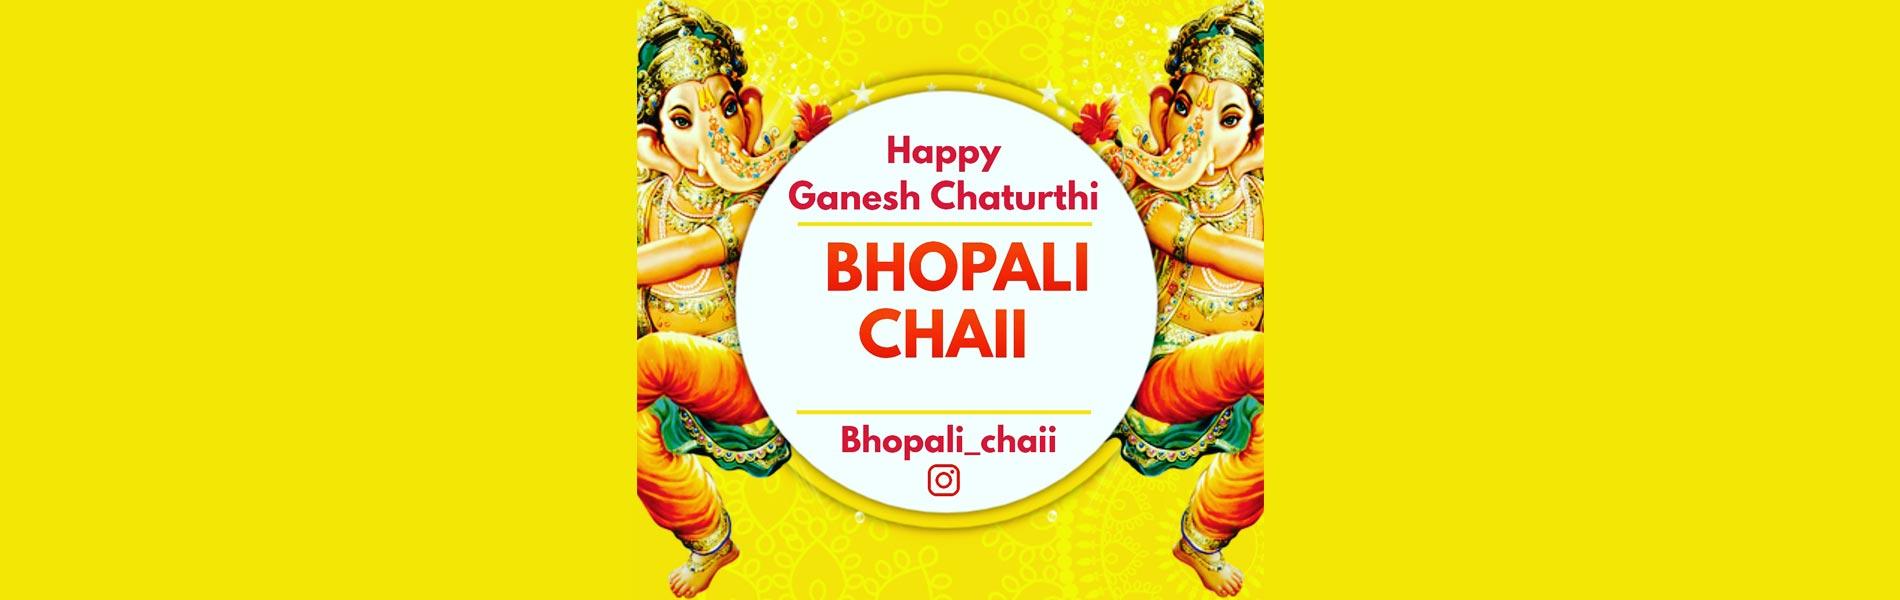 Bhopali Chaii Cafe